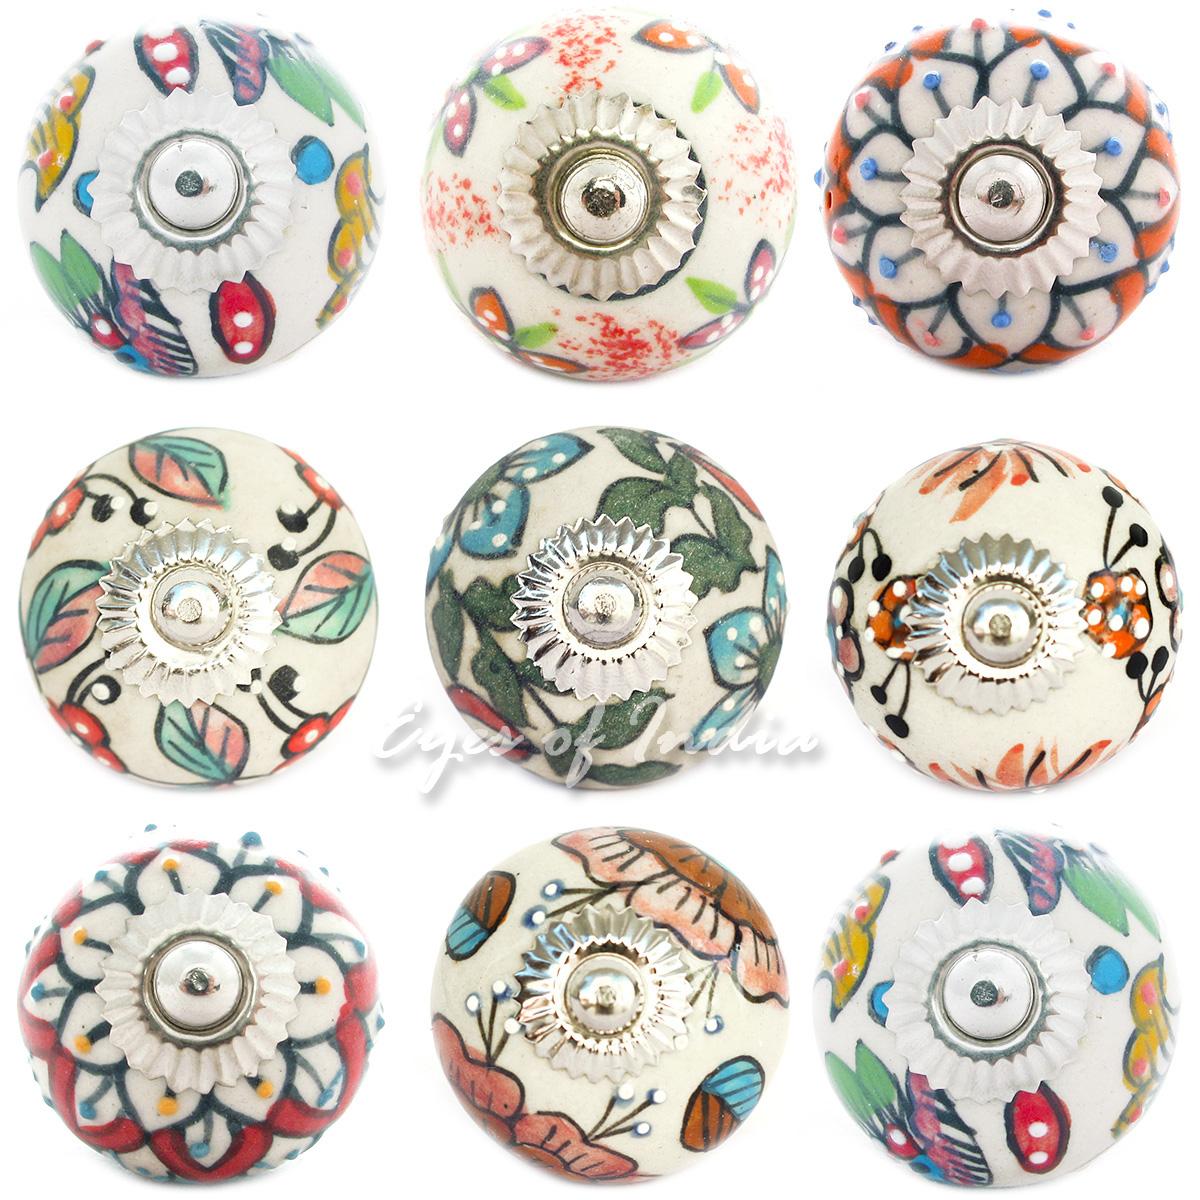 White ceramic cabinet dresser door cupboard knobs pulls for Painted ceramic cabinet knobs